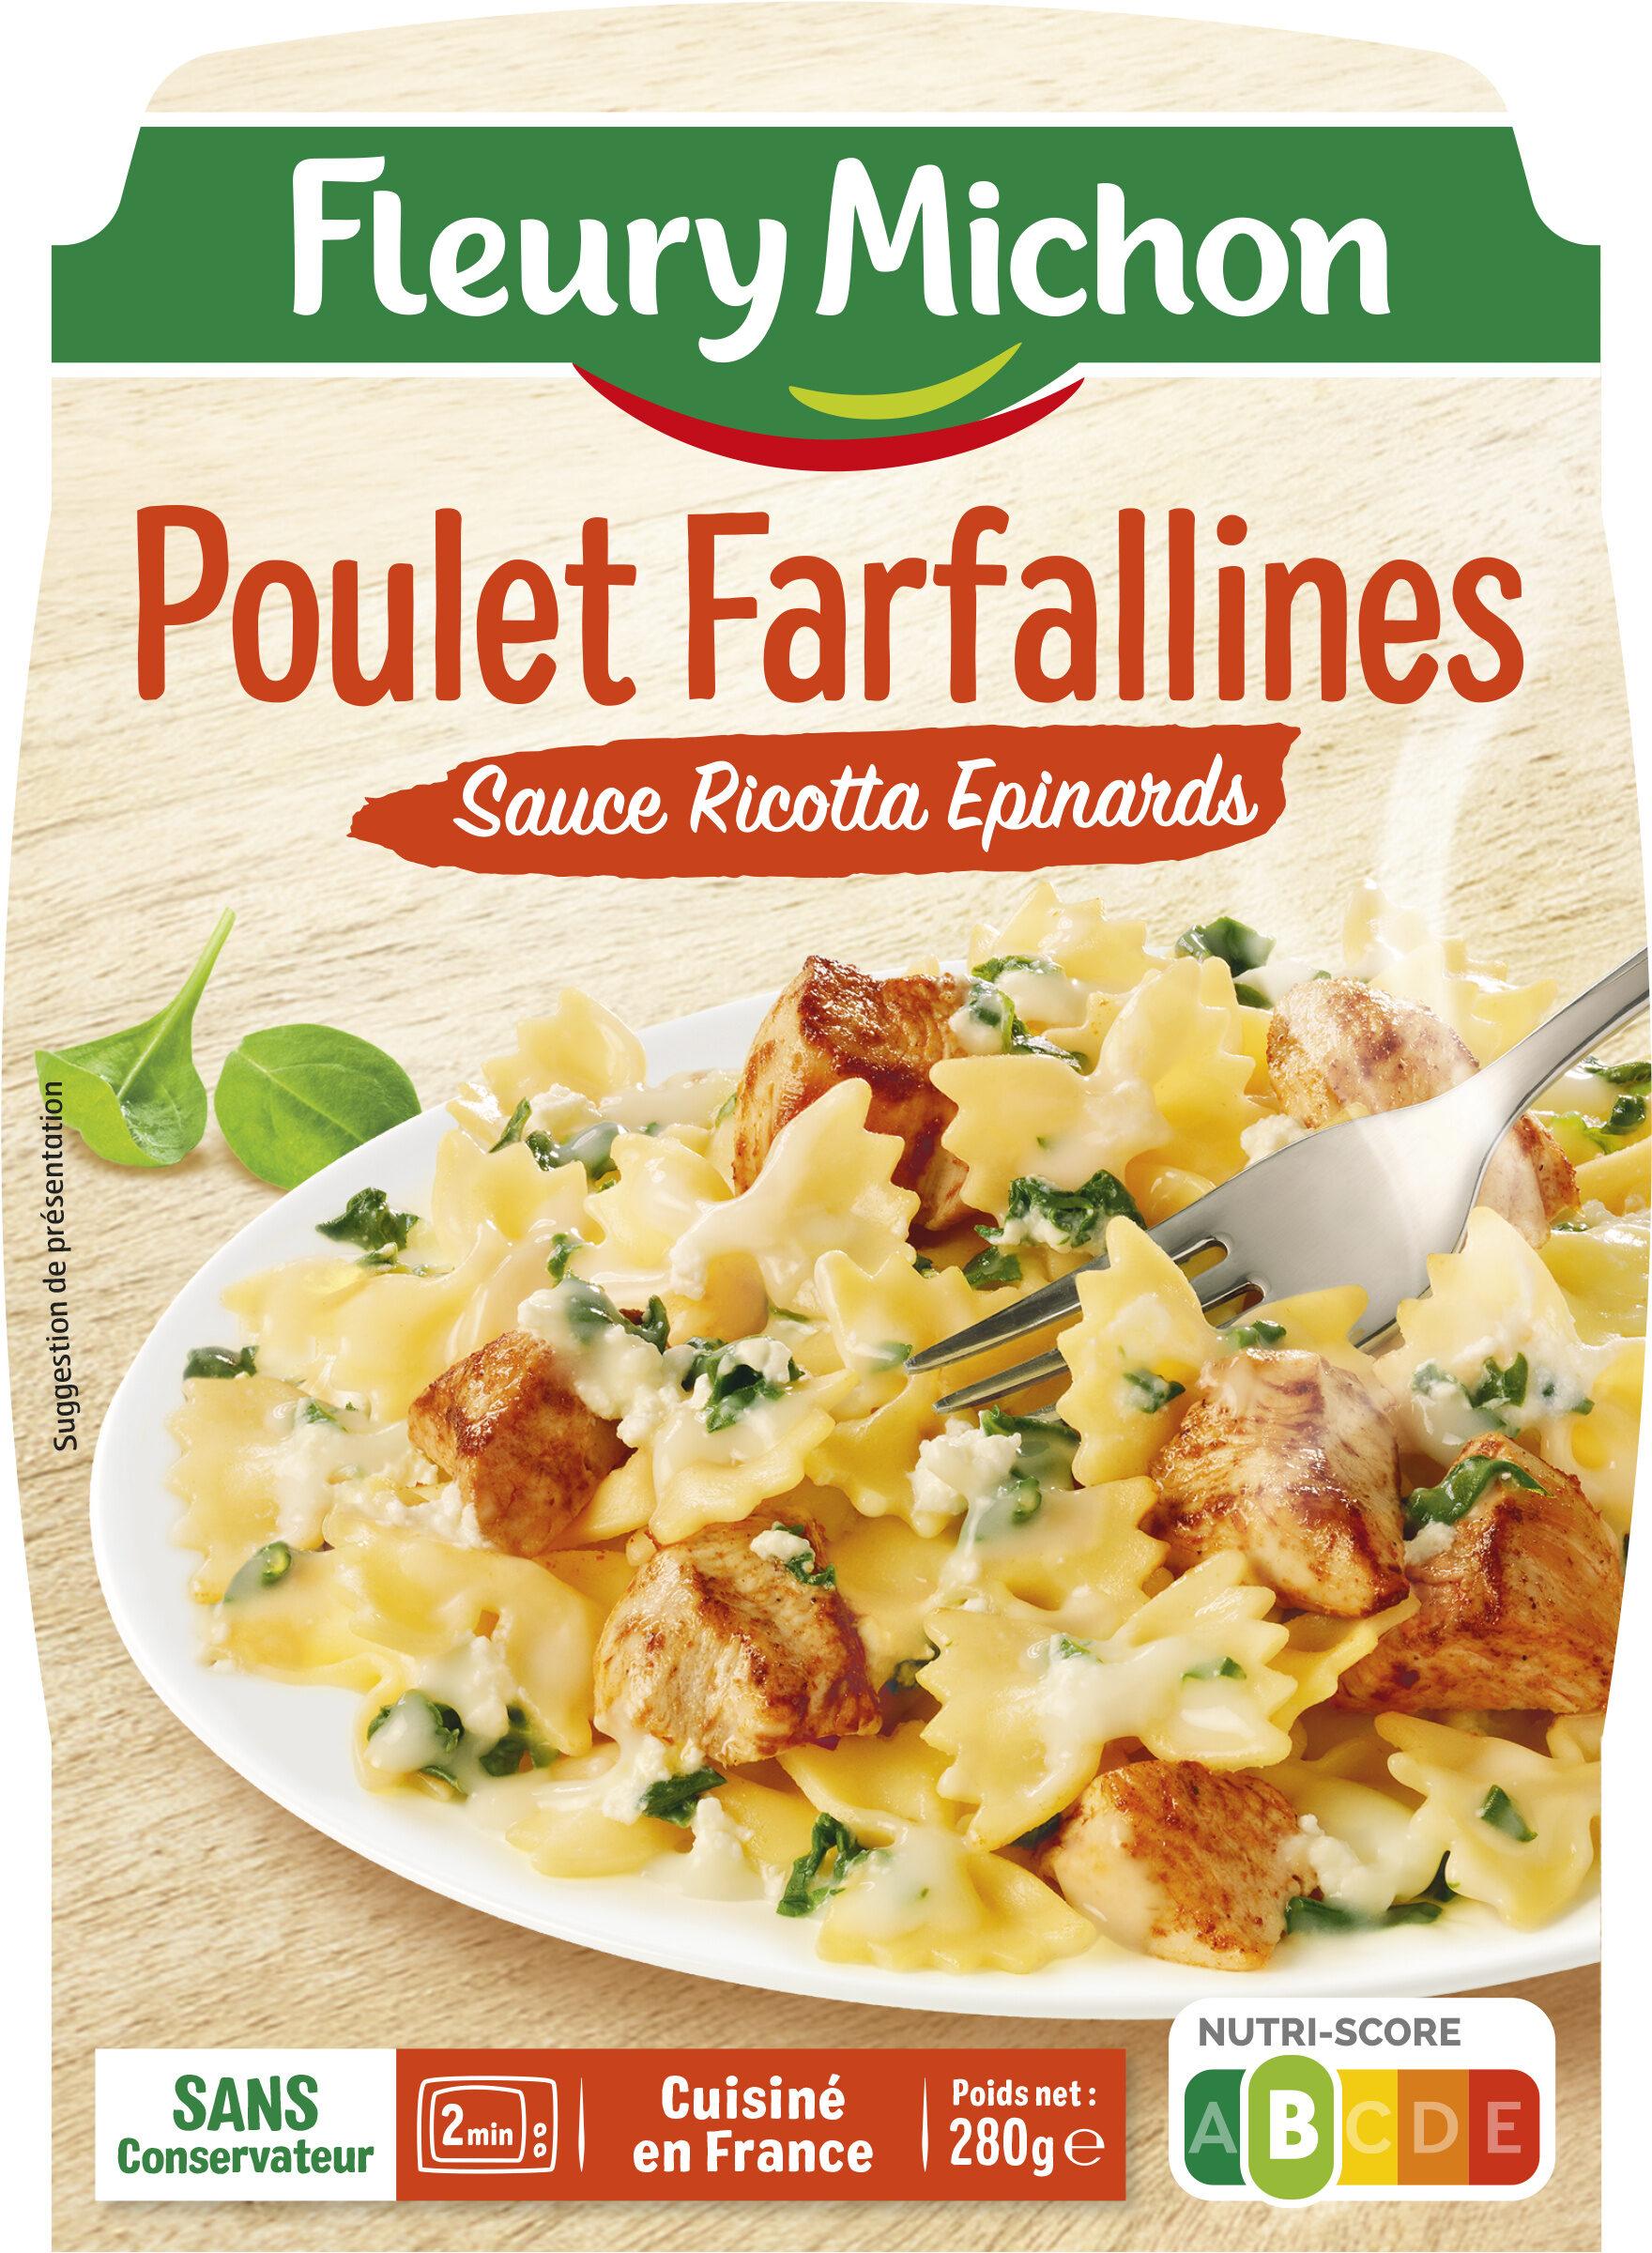 Poulet Farfallines Sauce Ricotta Epinards - Produit - fr